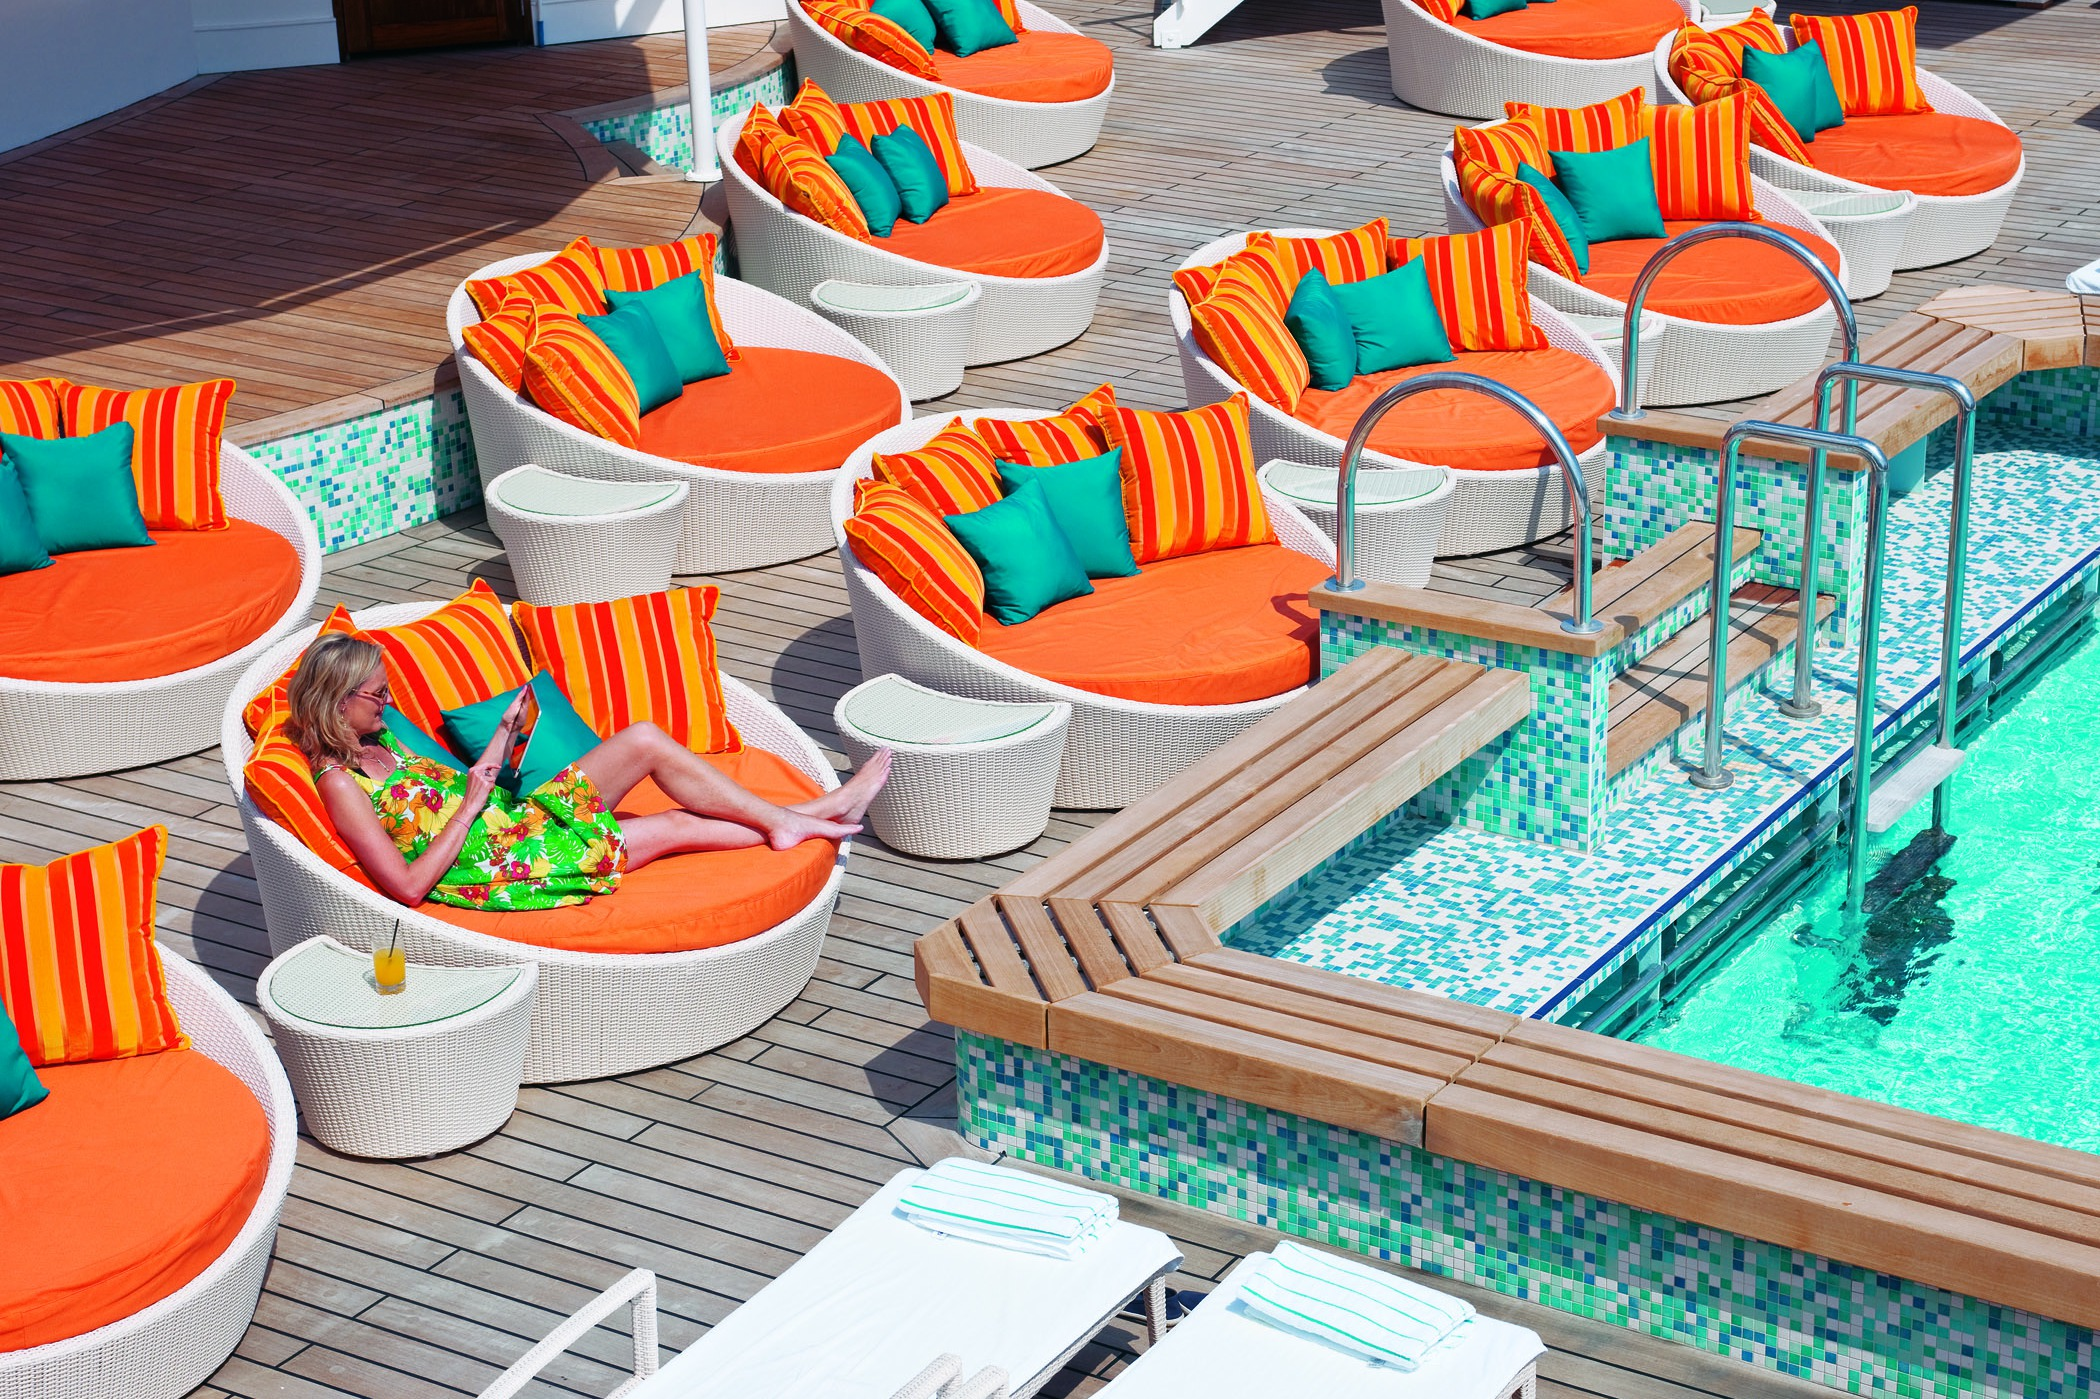 Crystal Cruises - Crystal Serenity pool